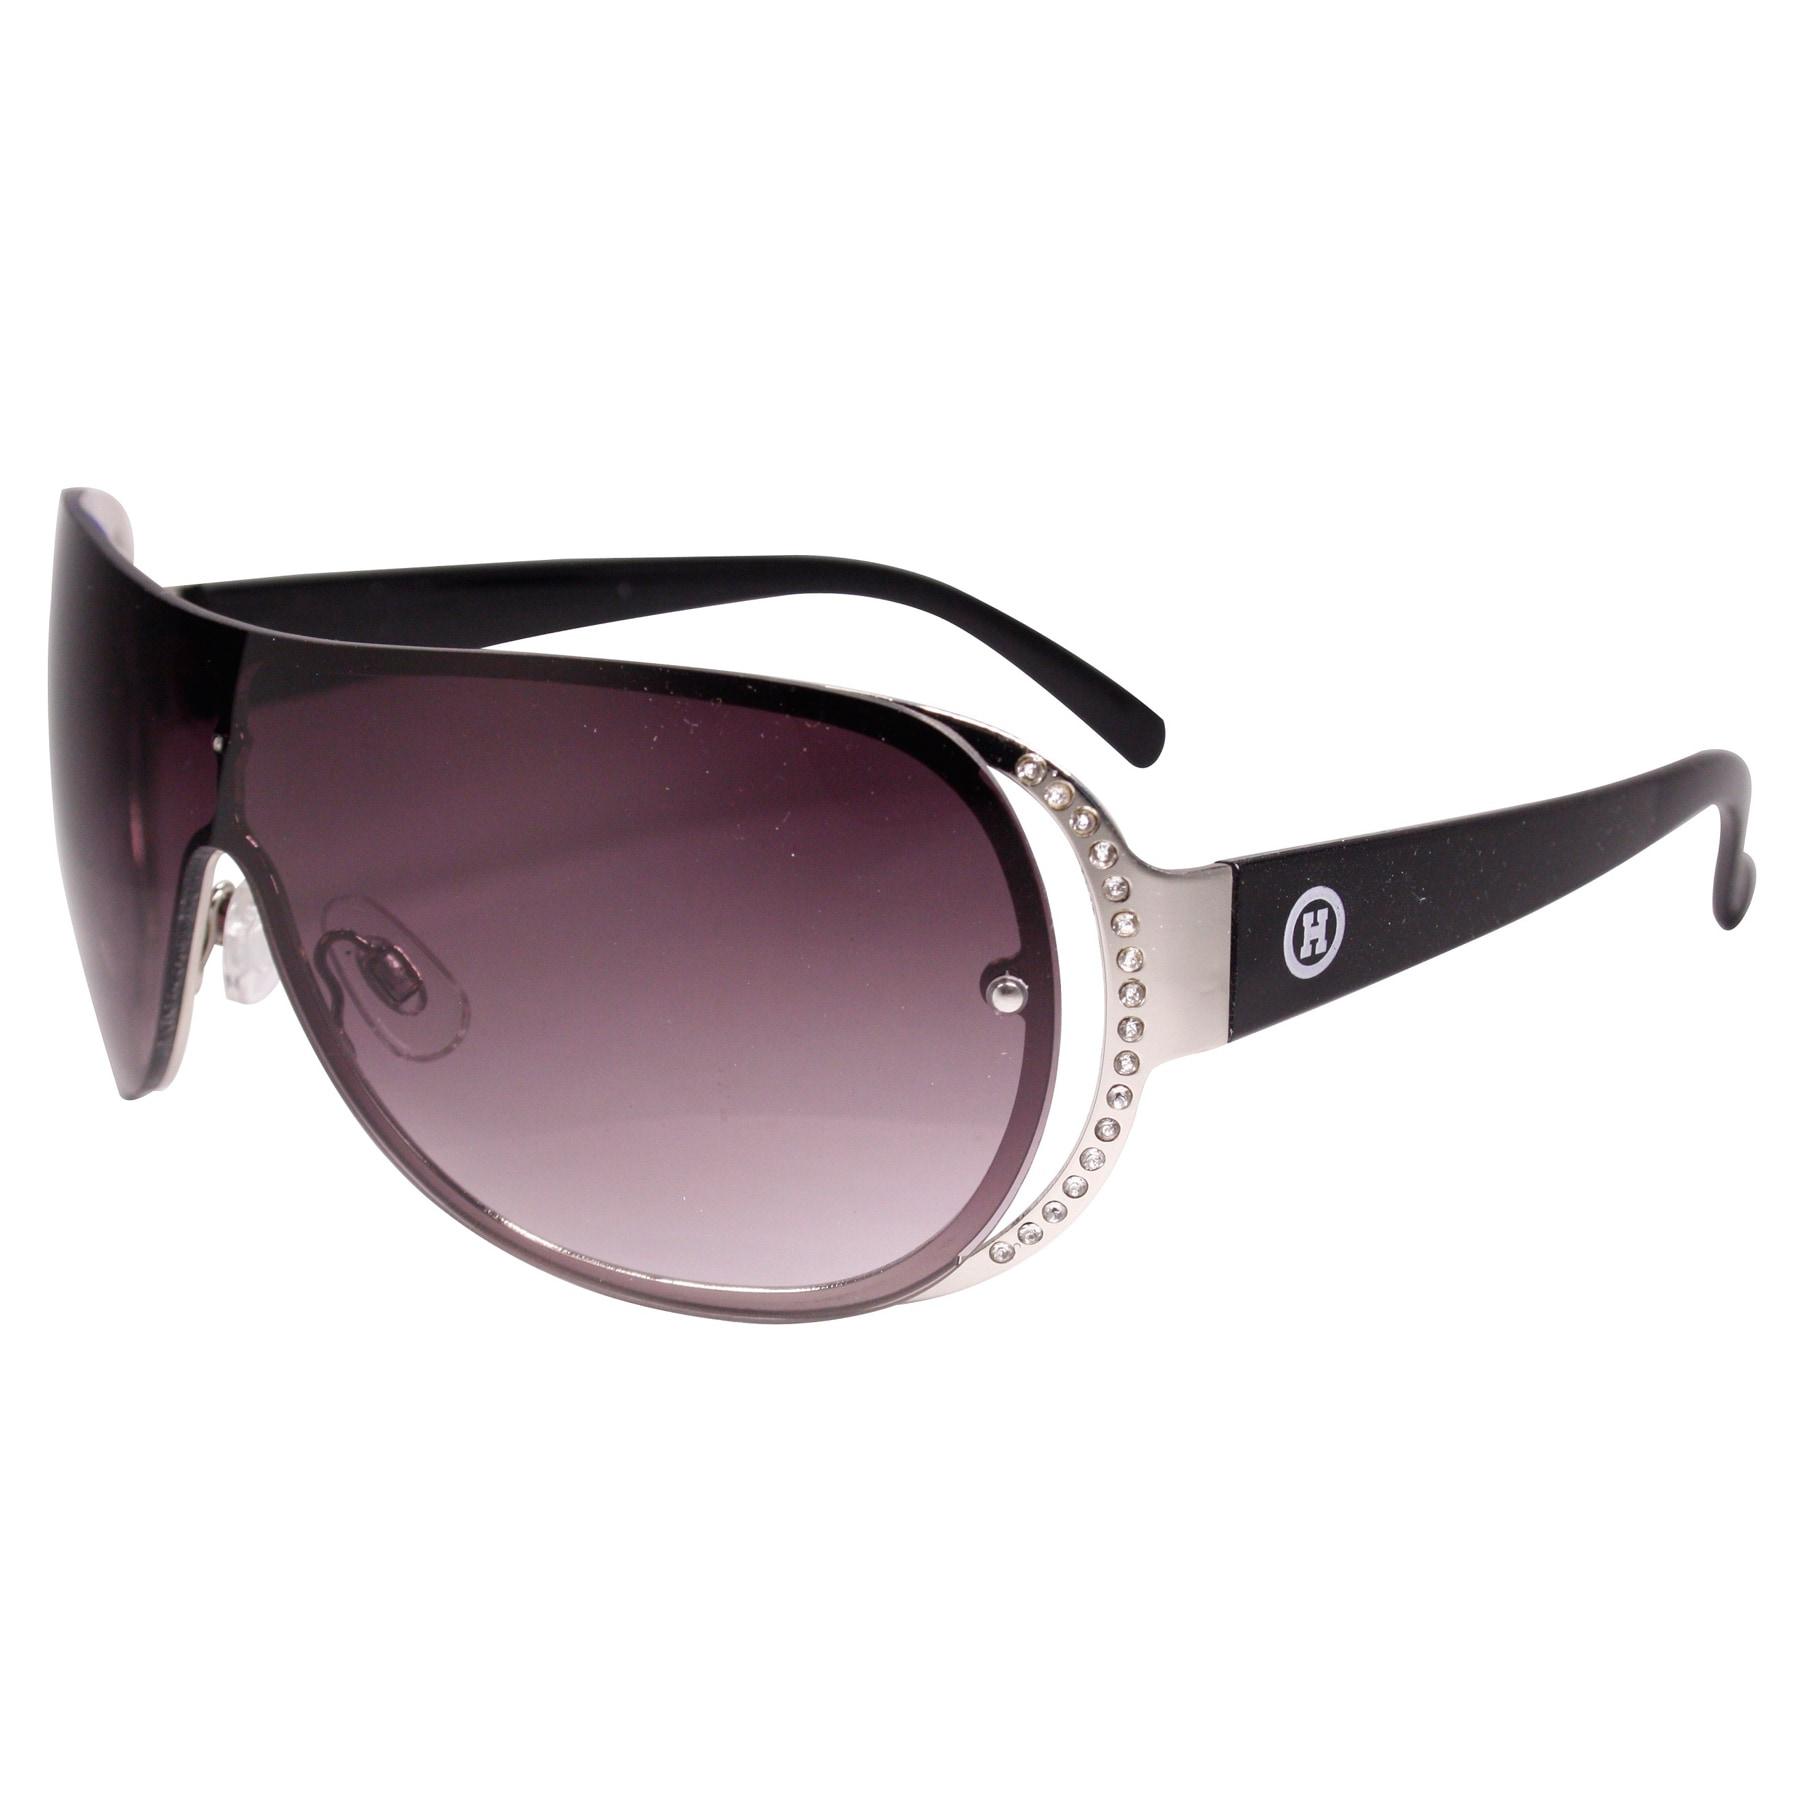 Hotties Women's HT-E439 Fashion Sunglasses